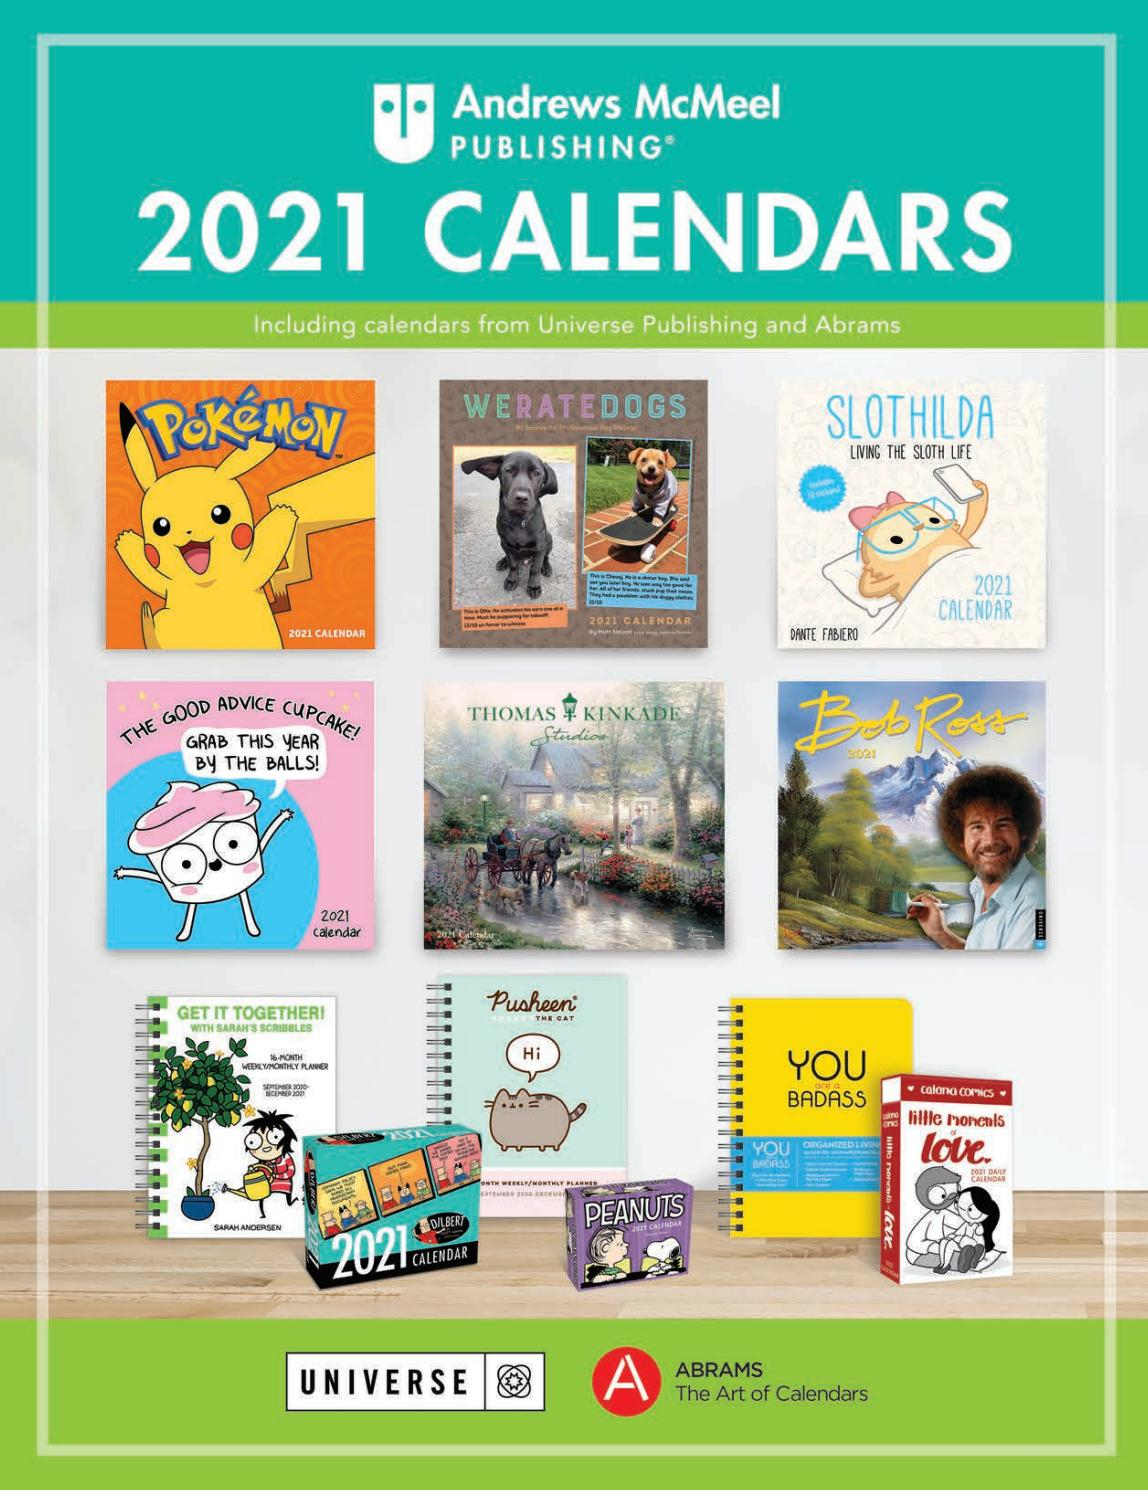 Andrews Mcmeel 2021 Calendar Catalogandrews Mcmeel inside Mifflin County School Ddistrict Calendar 2021-2020